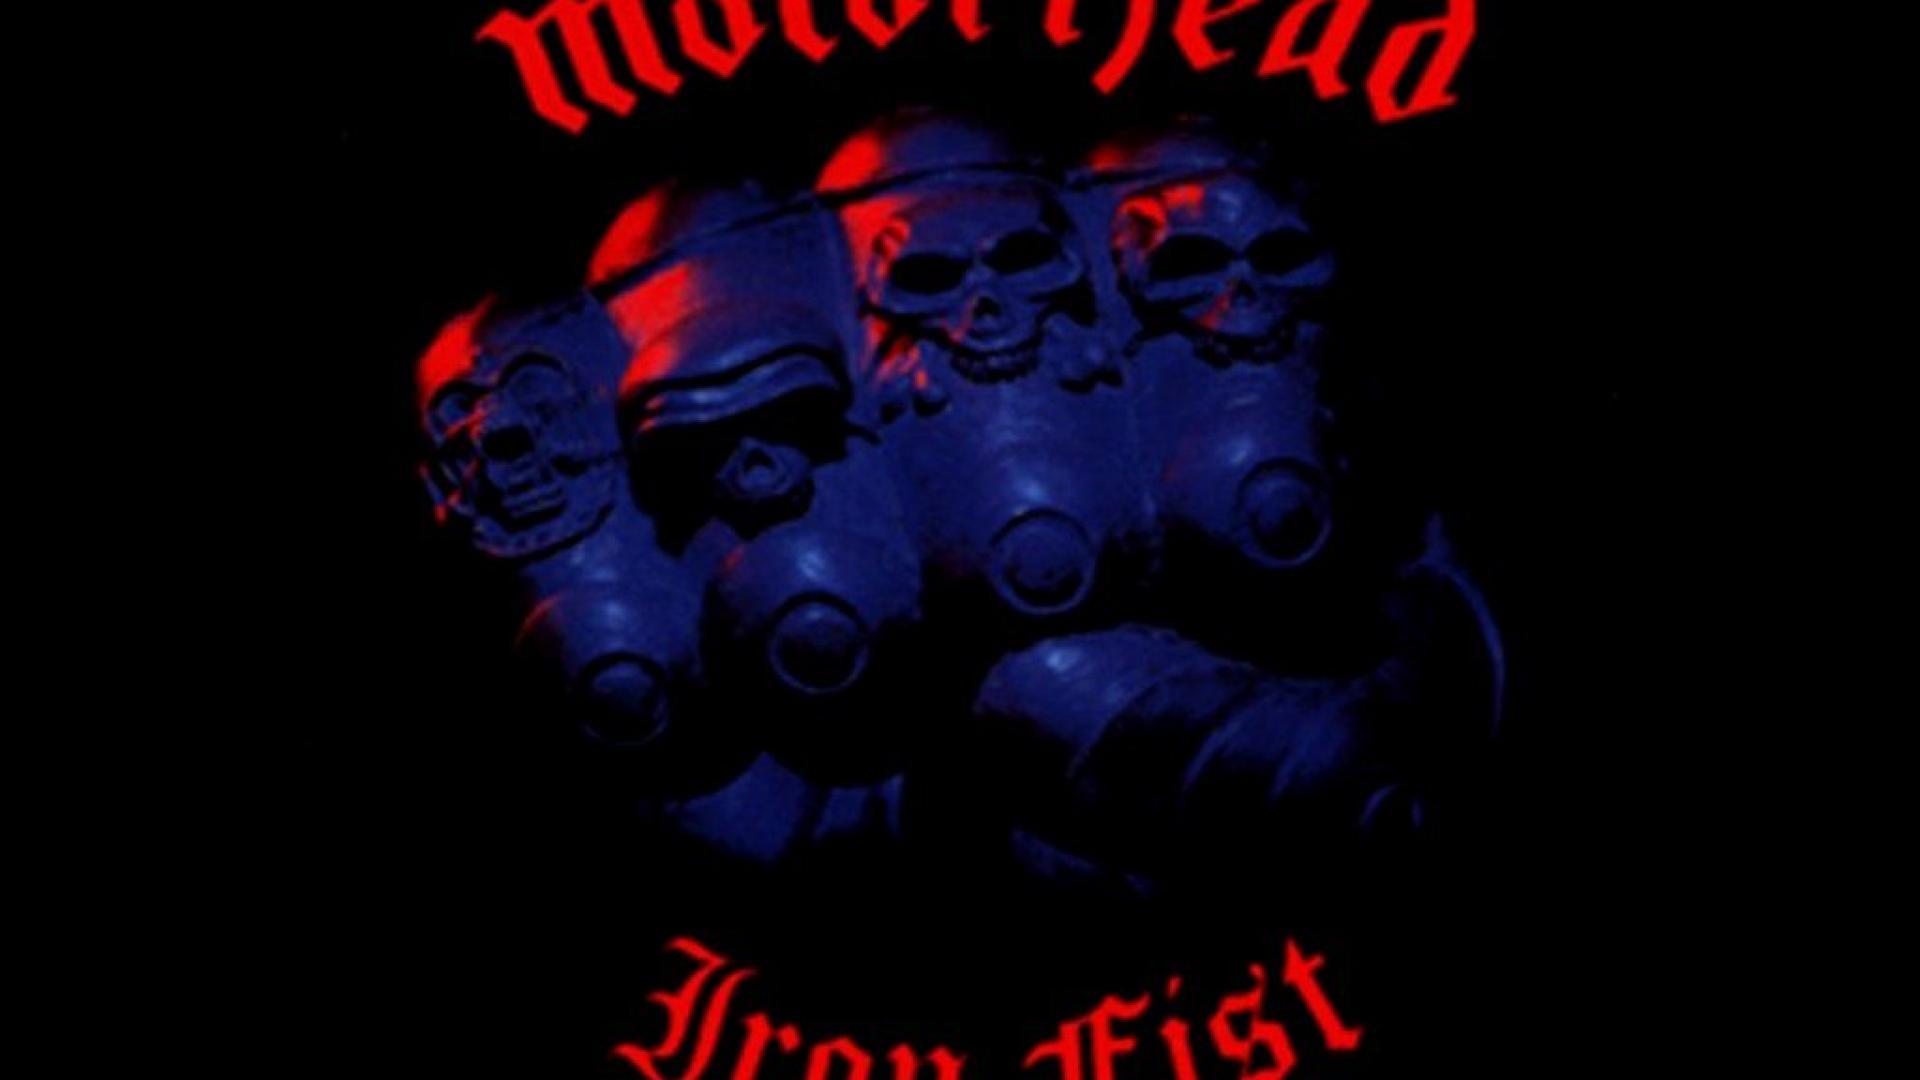 Motorhead bastards music hd wallpaper 21996 hq desktop - Motorhead Hd Wallpaper Wallpaper 27315 Hq Desktop Wallpapers